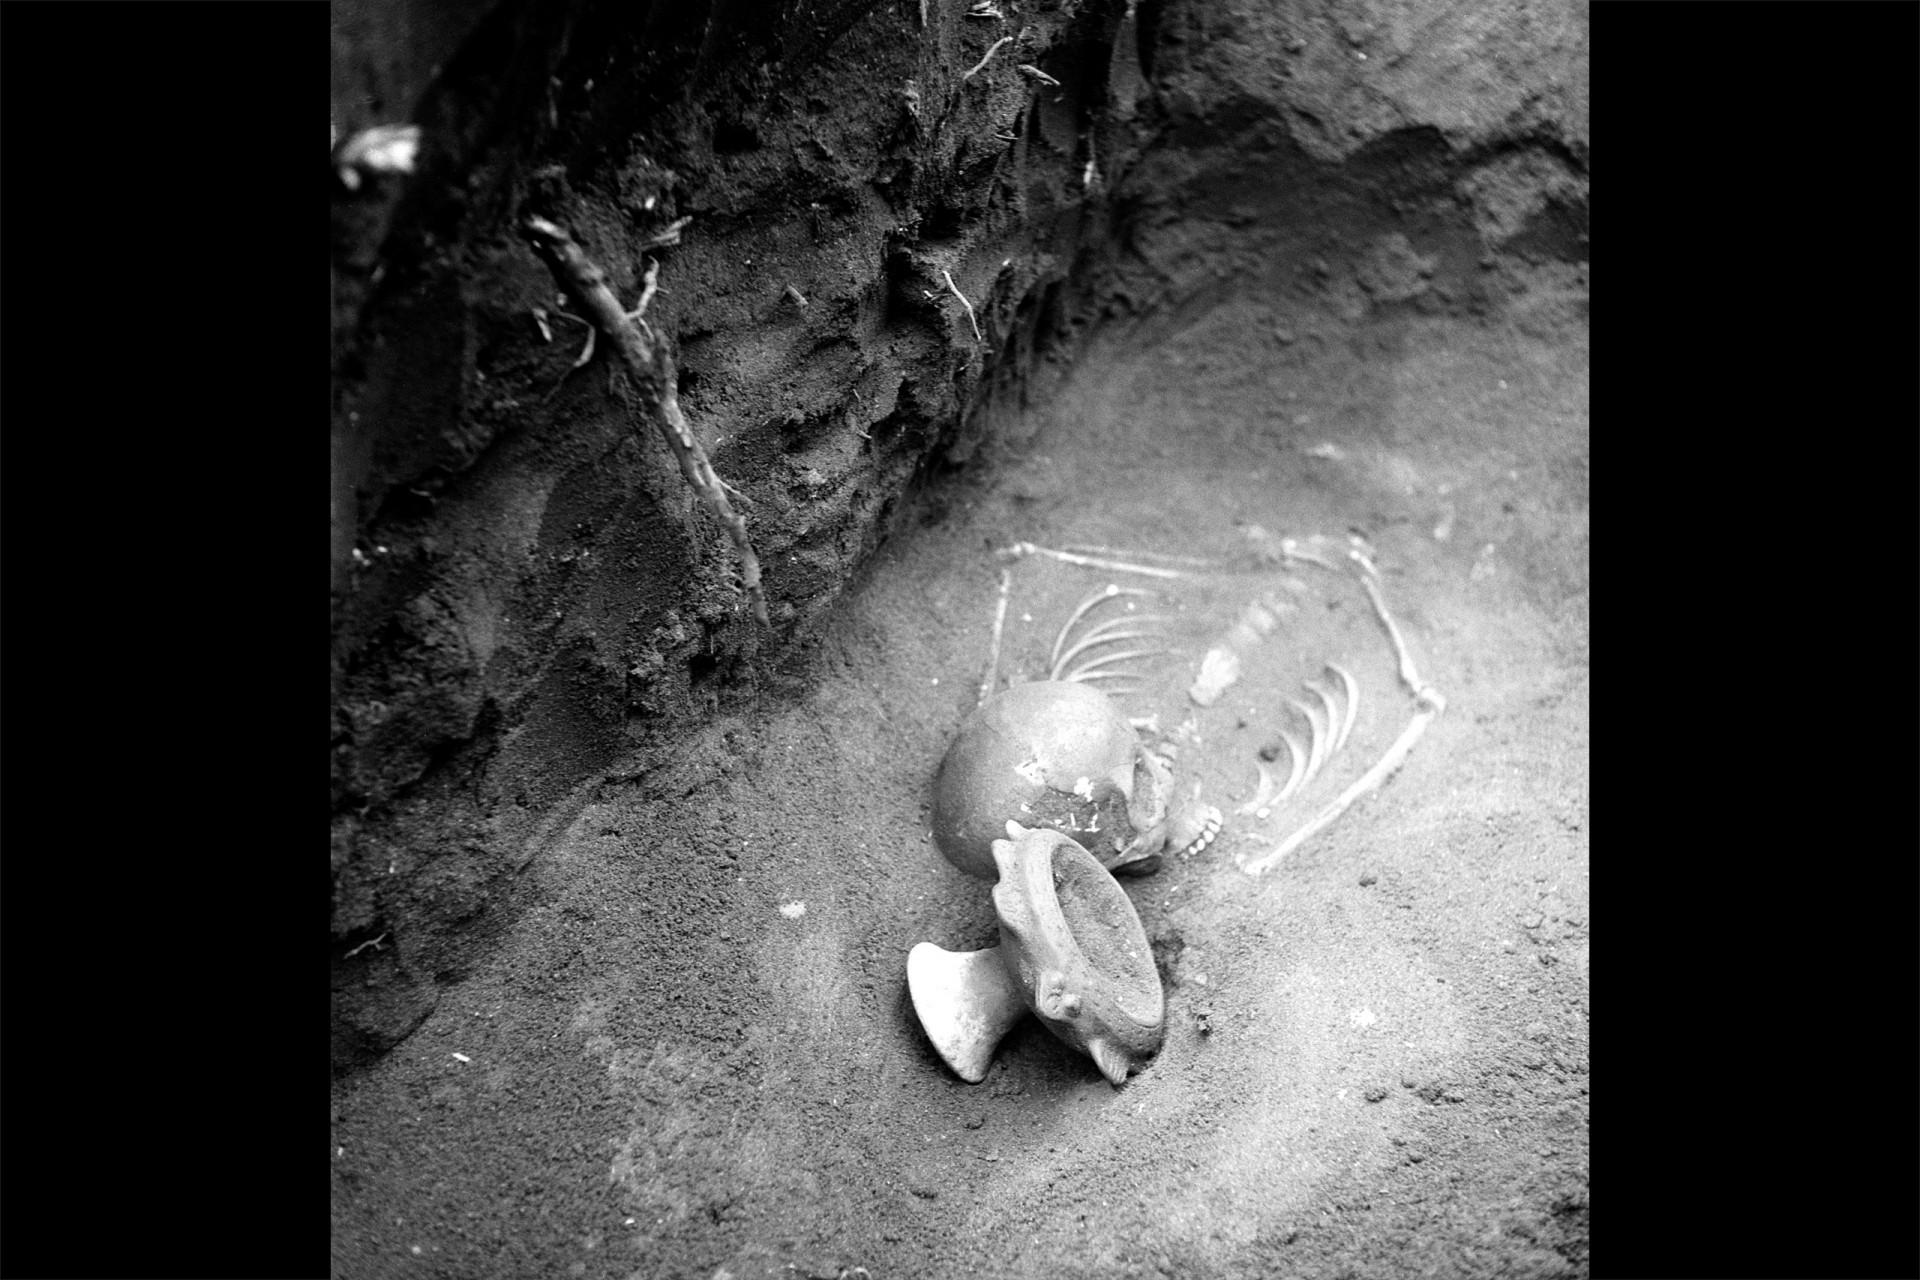 Pre-Columbian burials